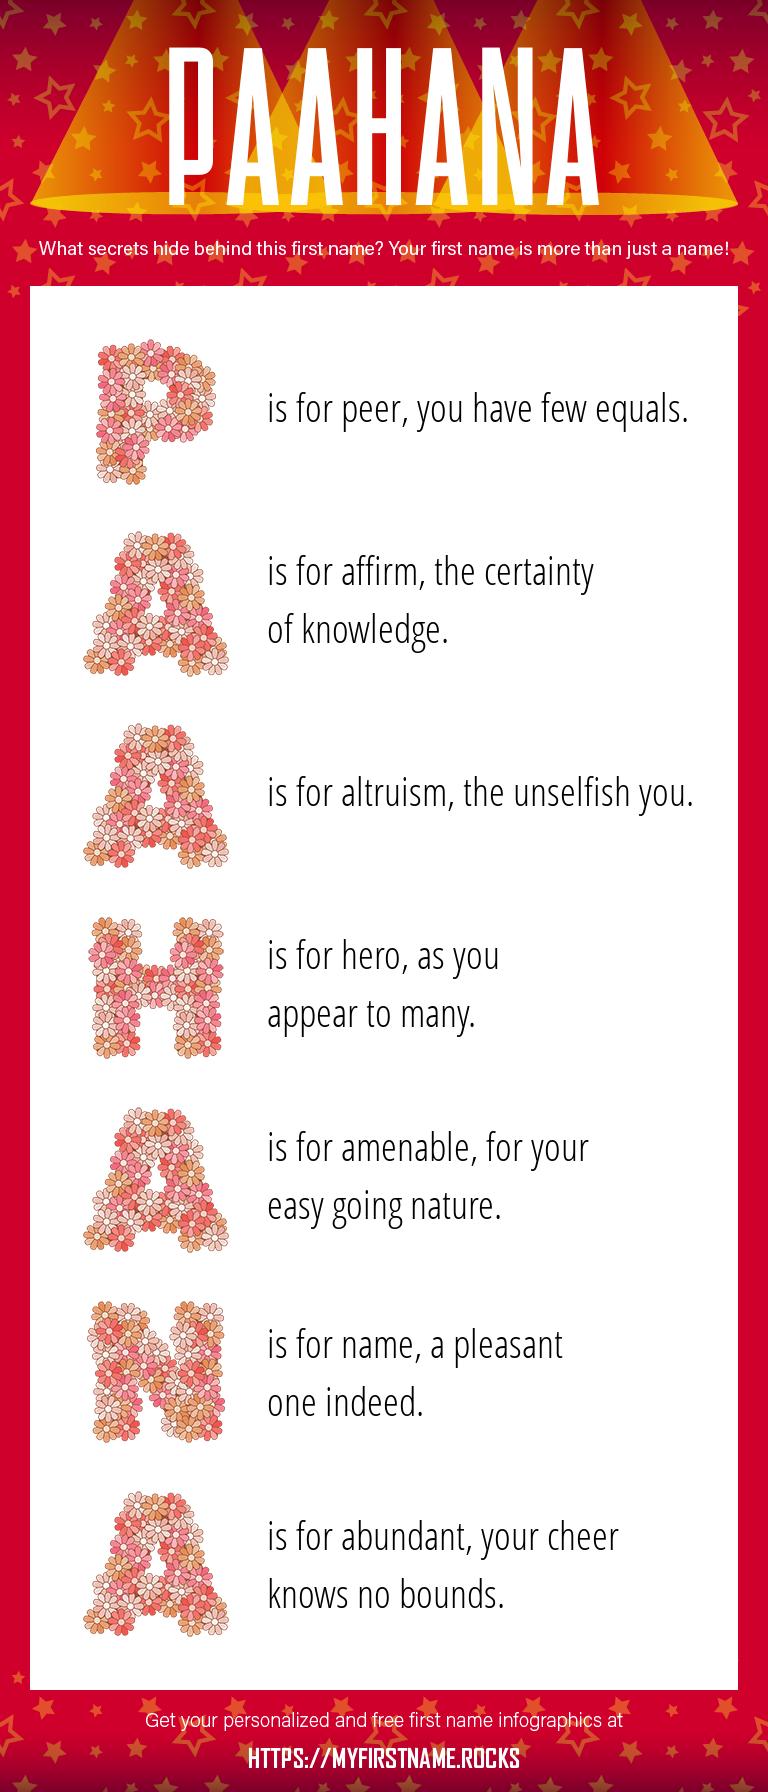 Paahana Infographics